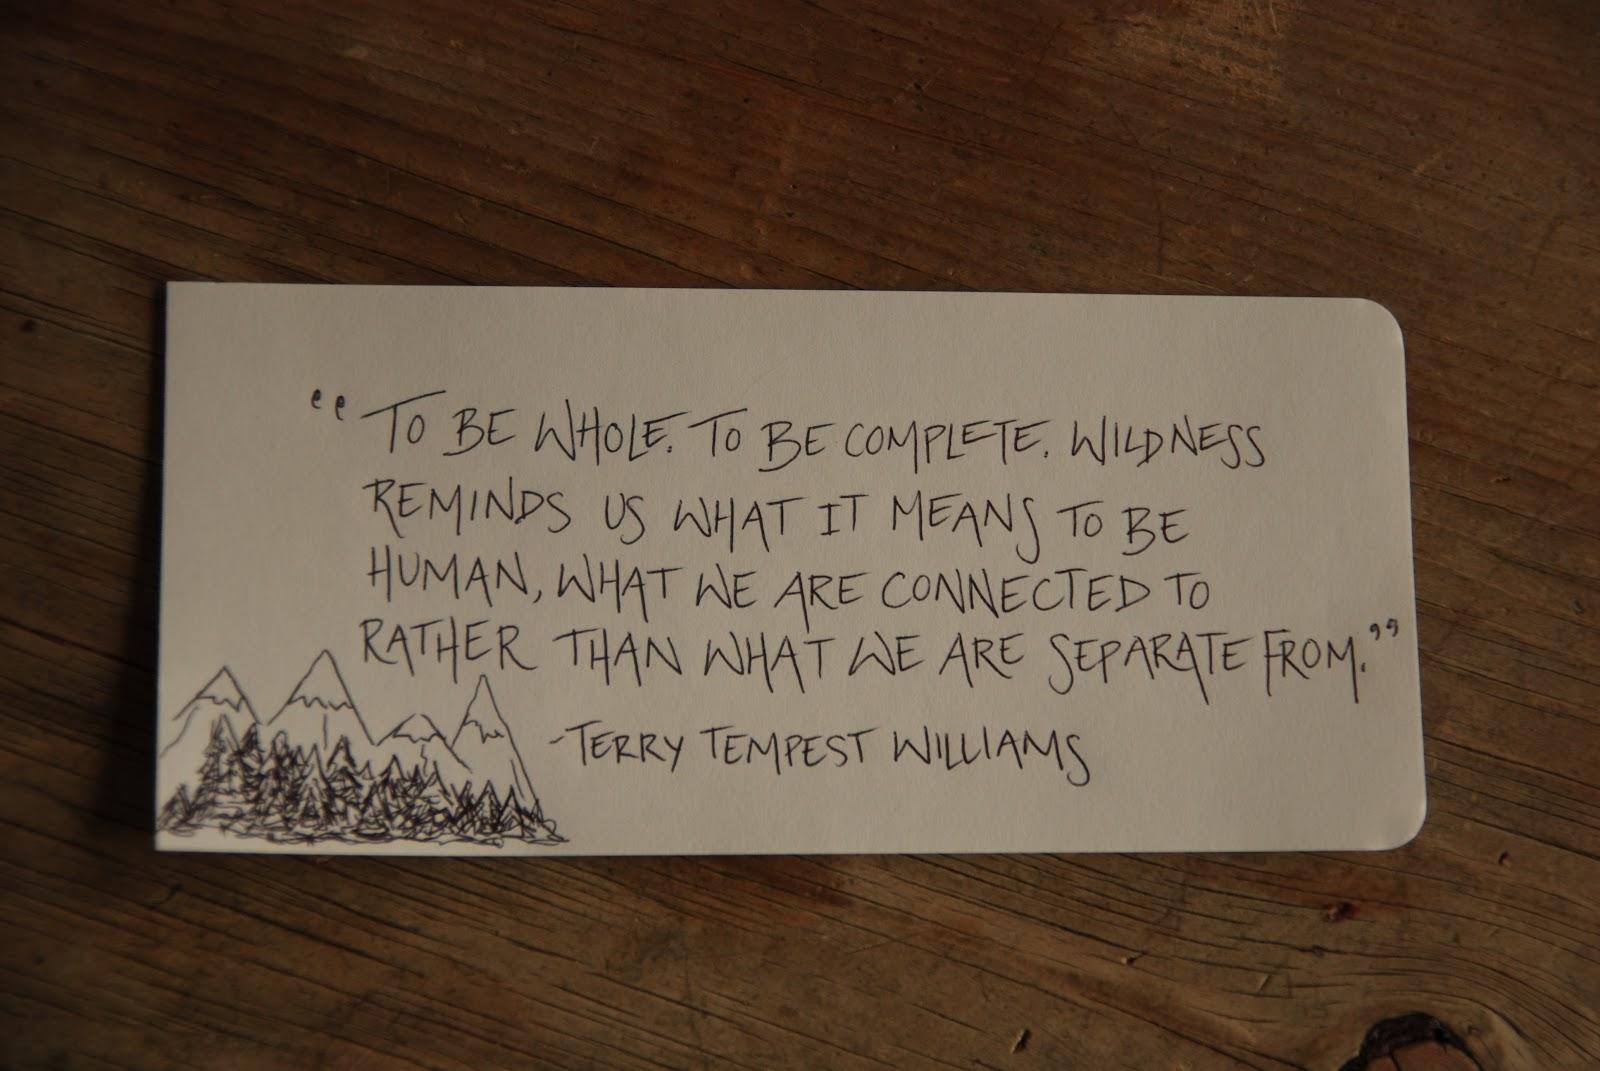 Terry Tempest Williams's quote #1